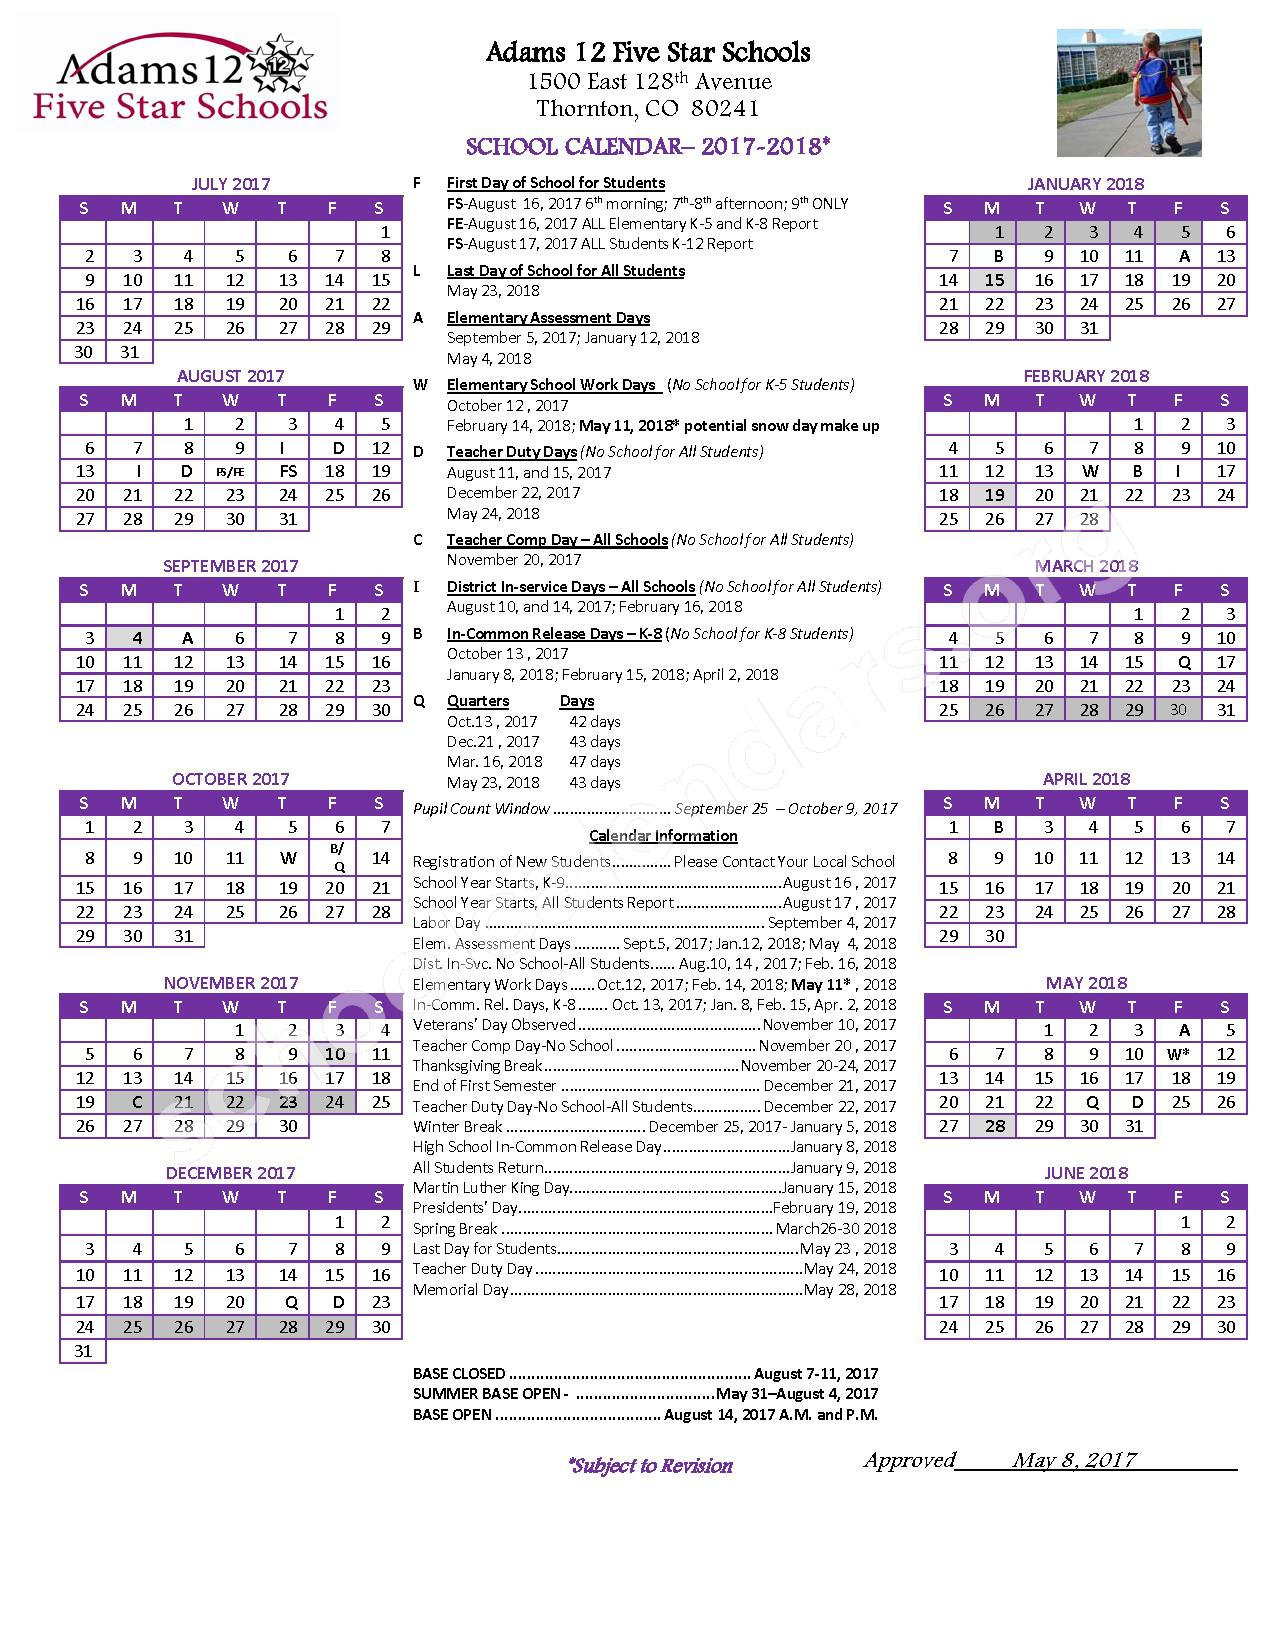 Skyline Vista Elementary School Calendars Denver Co